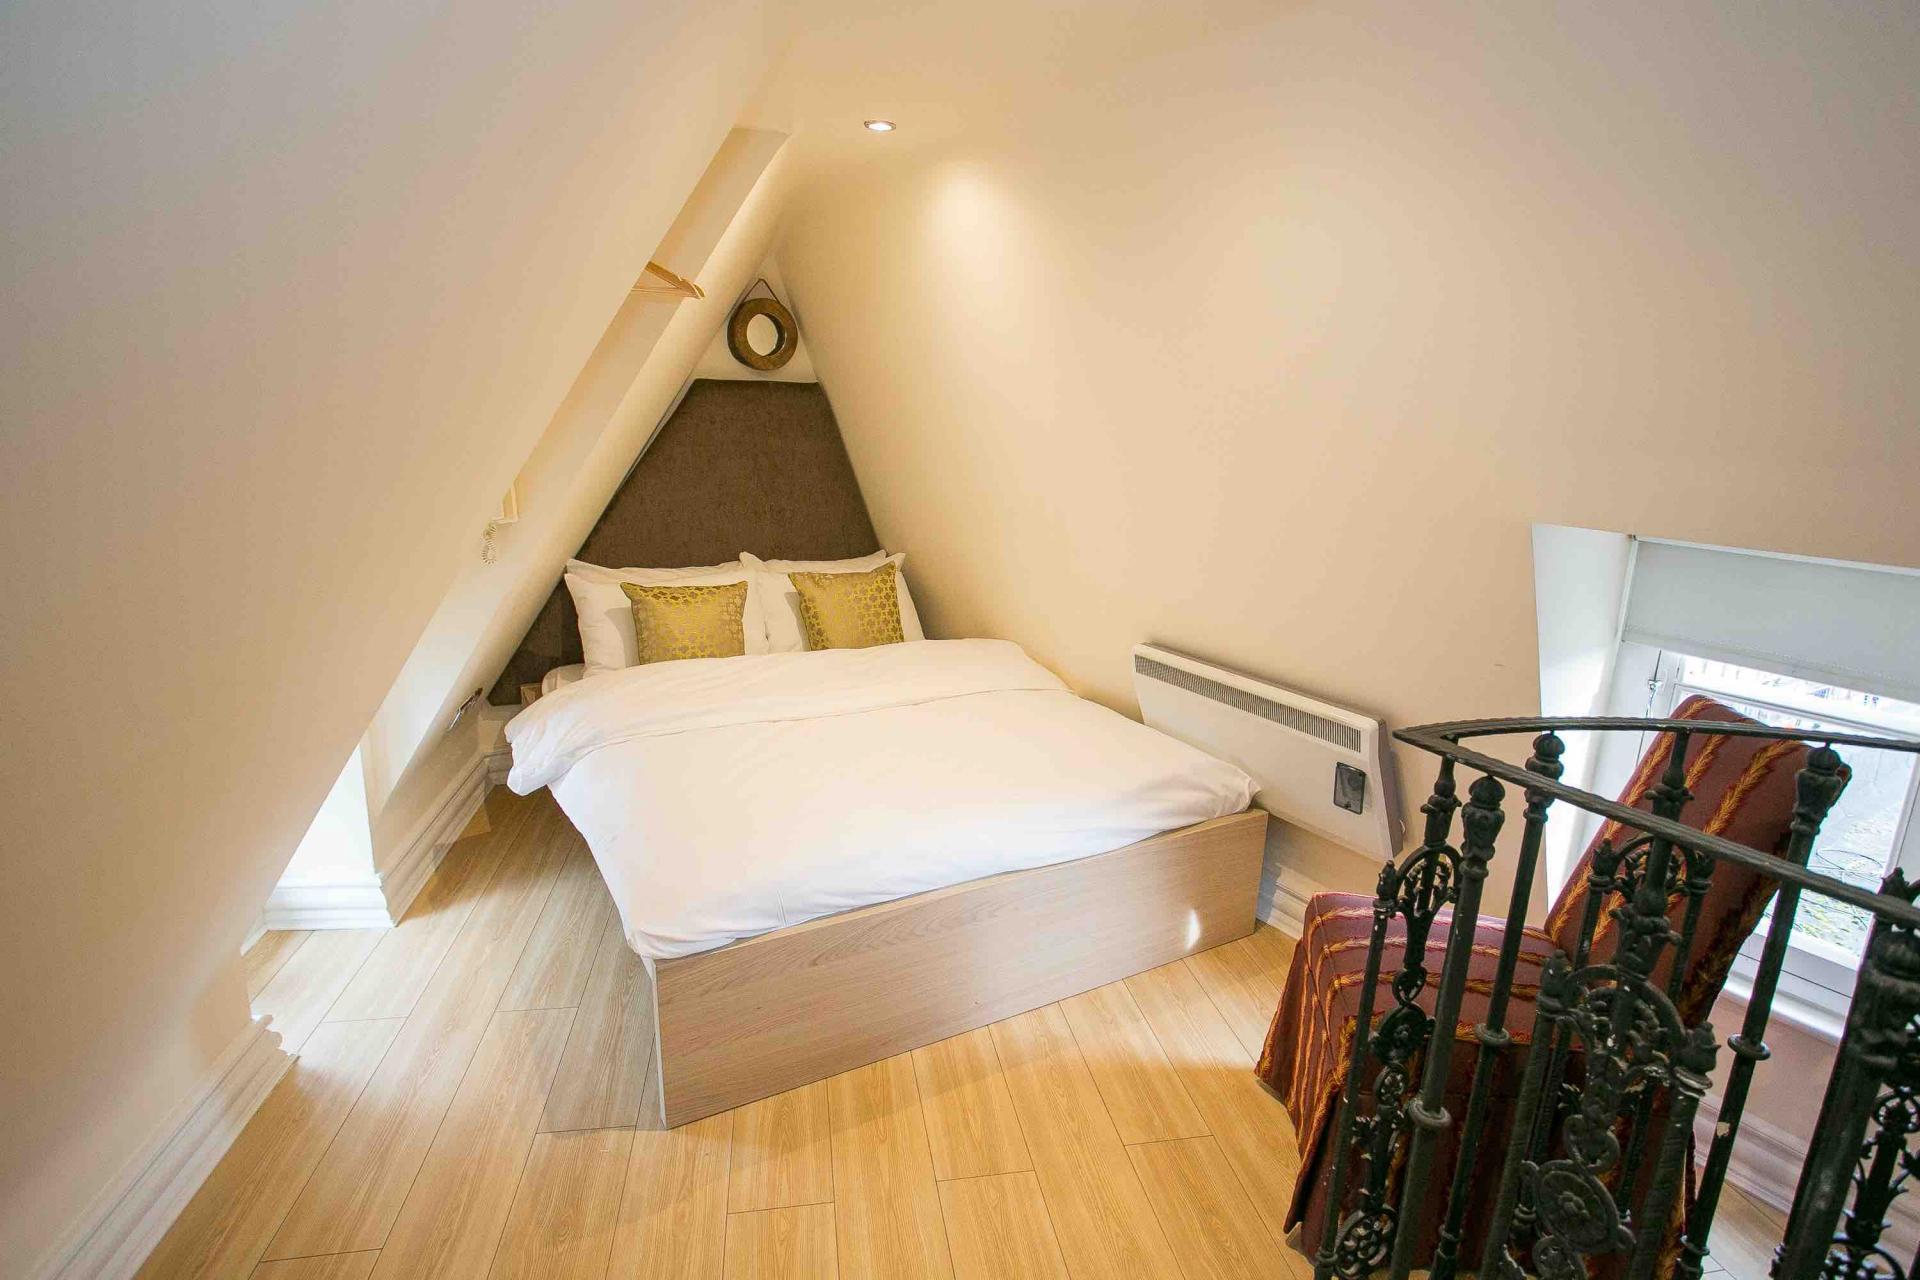 Bedroom at O'Connell Bridge Apartments, Centre, Dublin